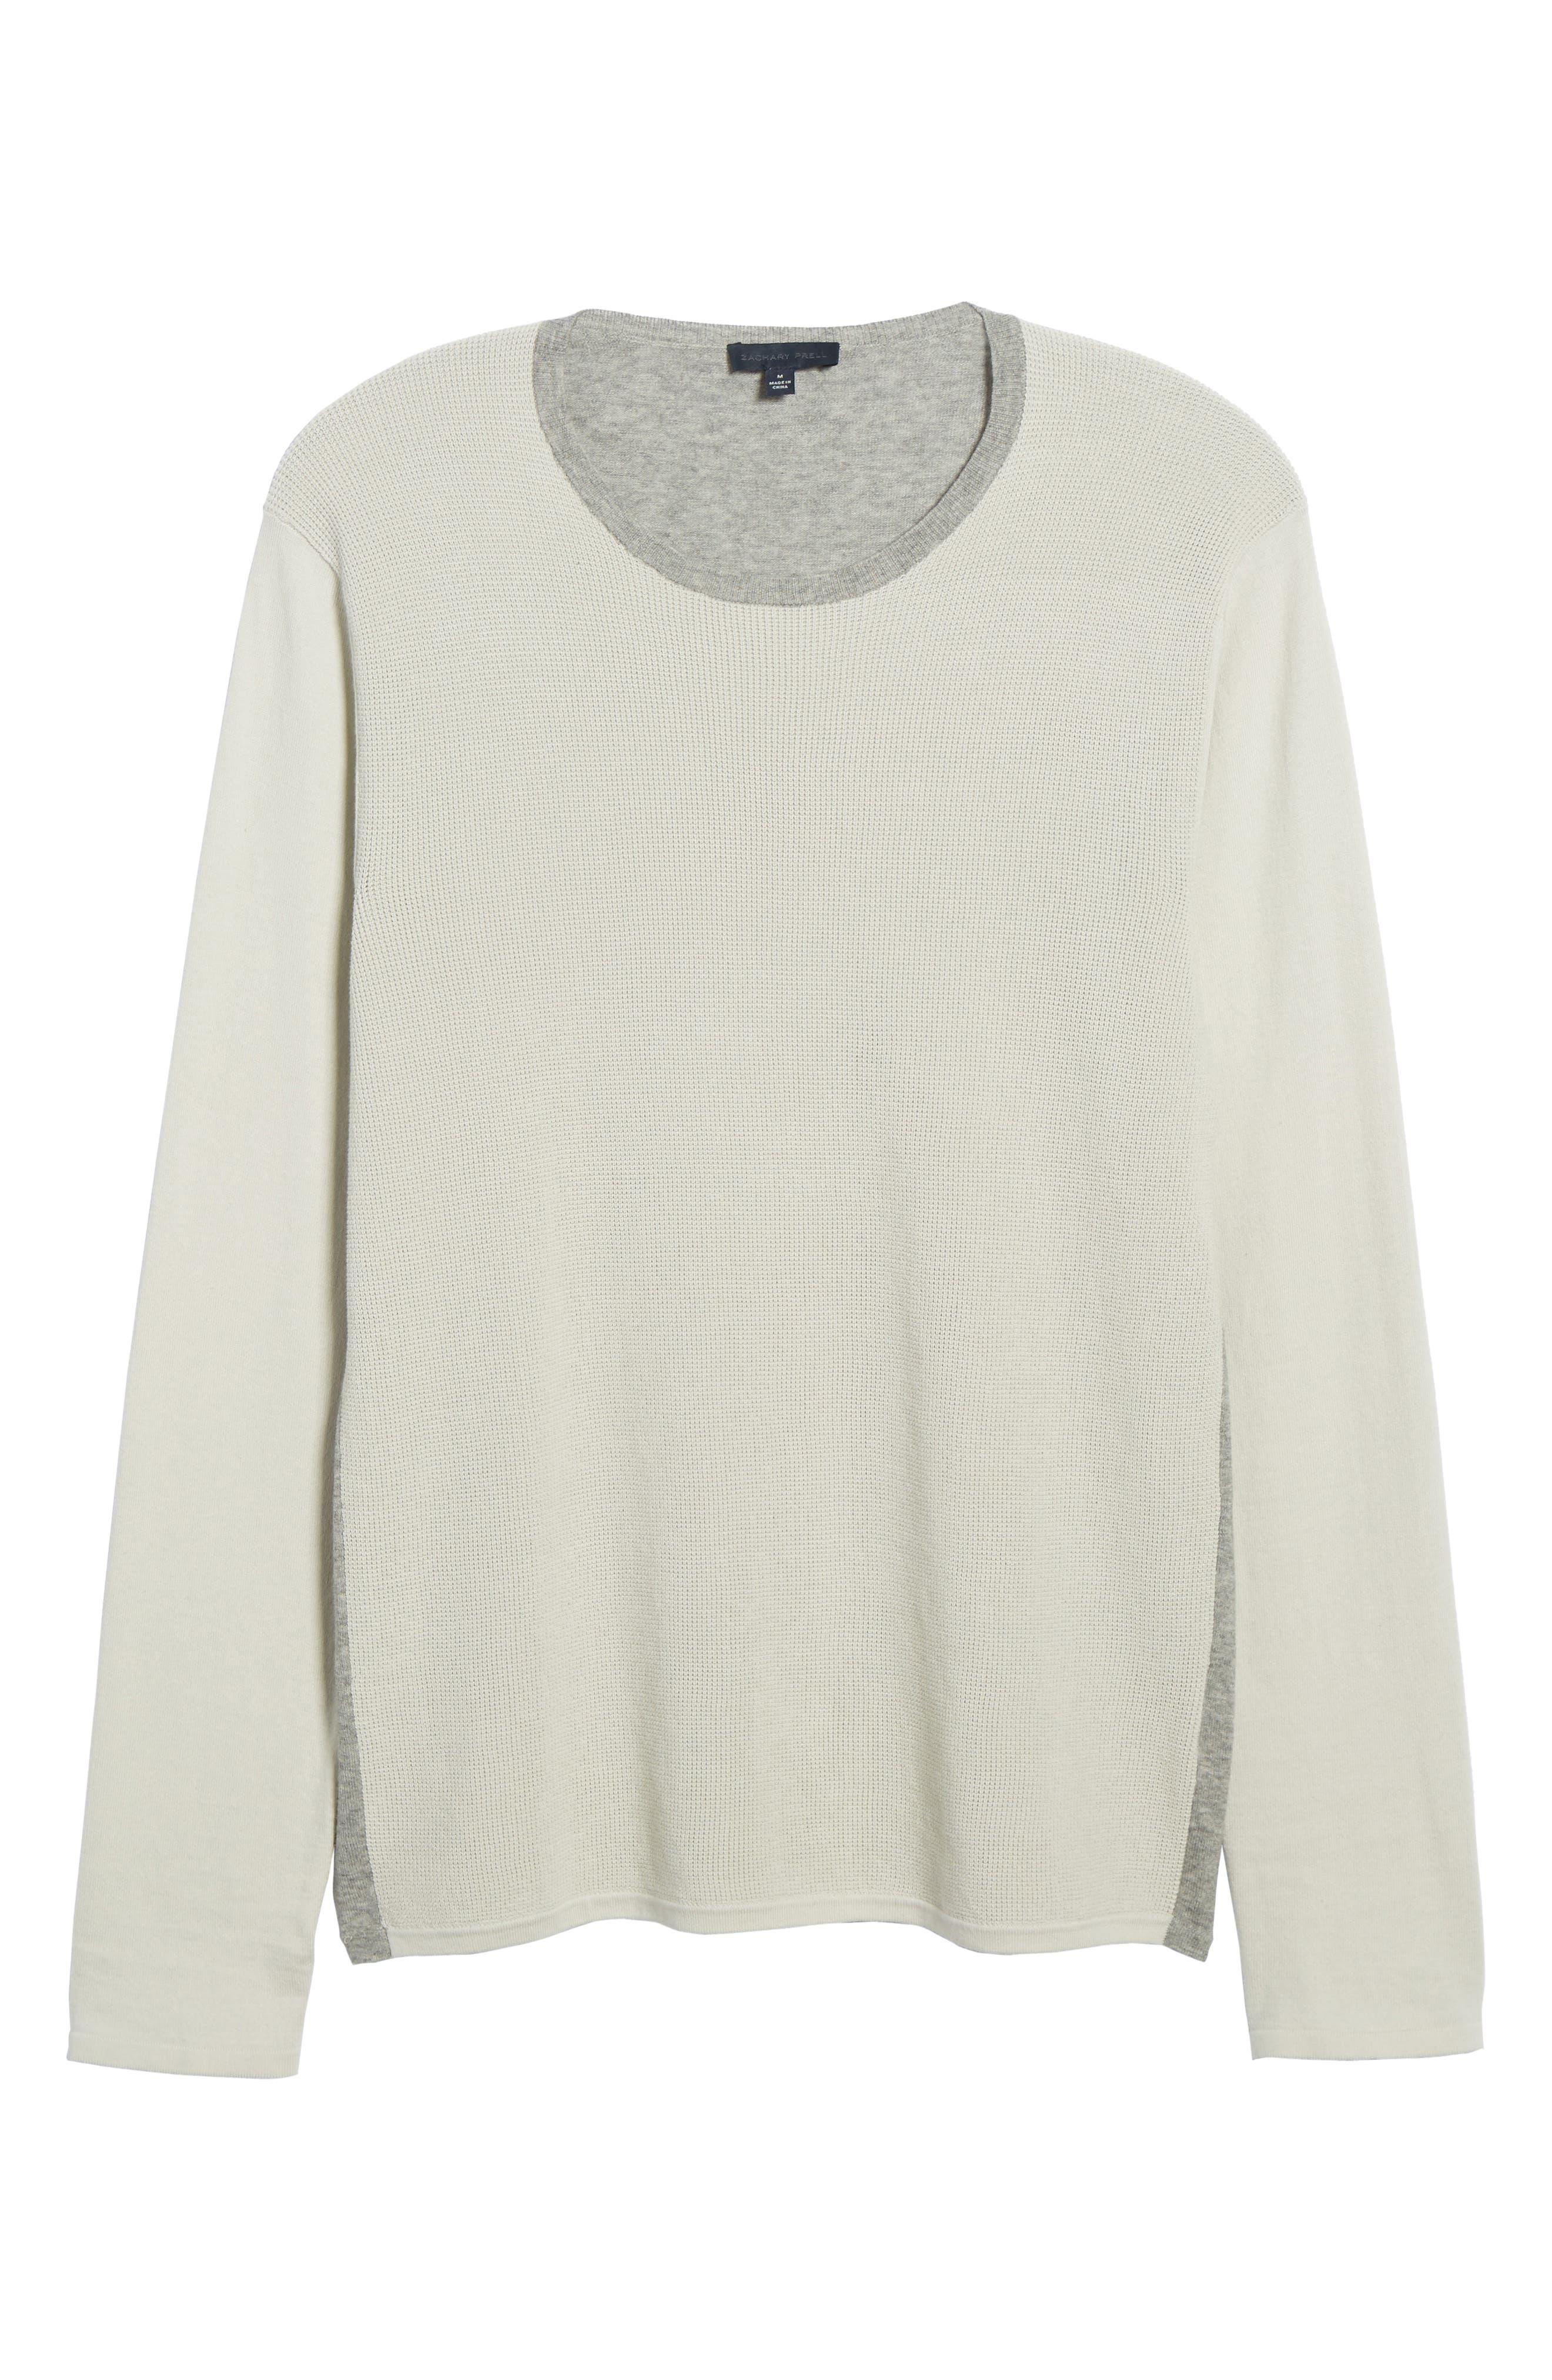 ZACHARY PRELL, Lakeside Sweater, Alternate thumbnail 6, color, LIGHT GREY